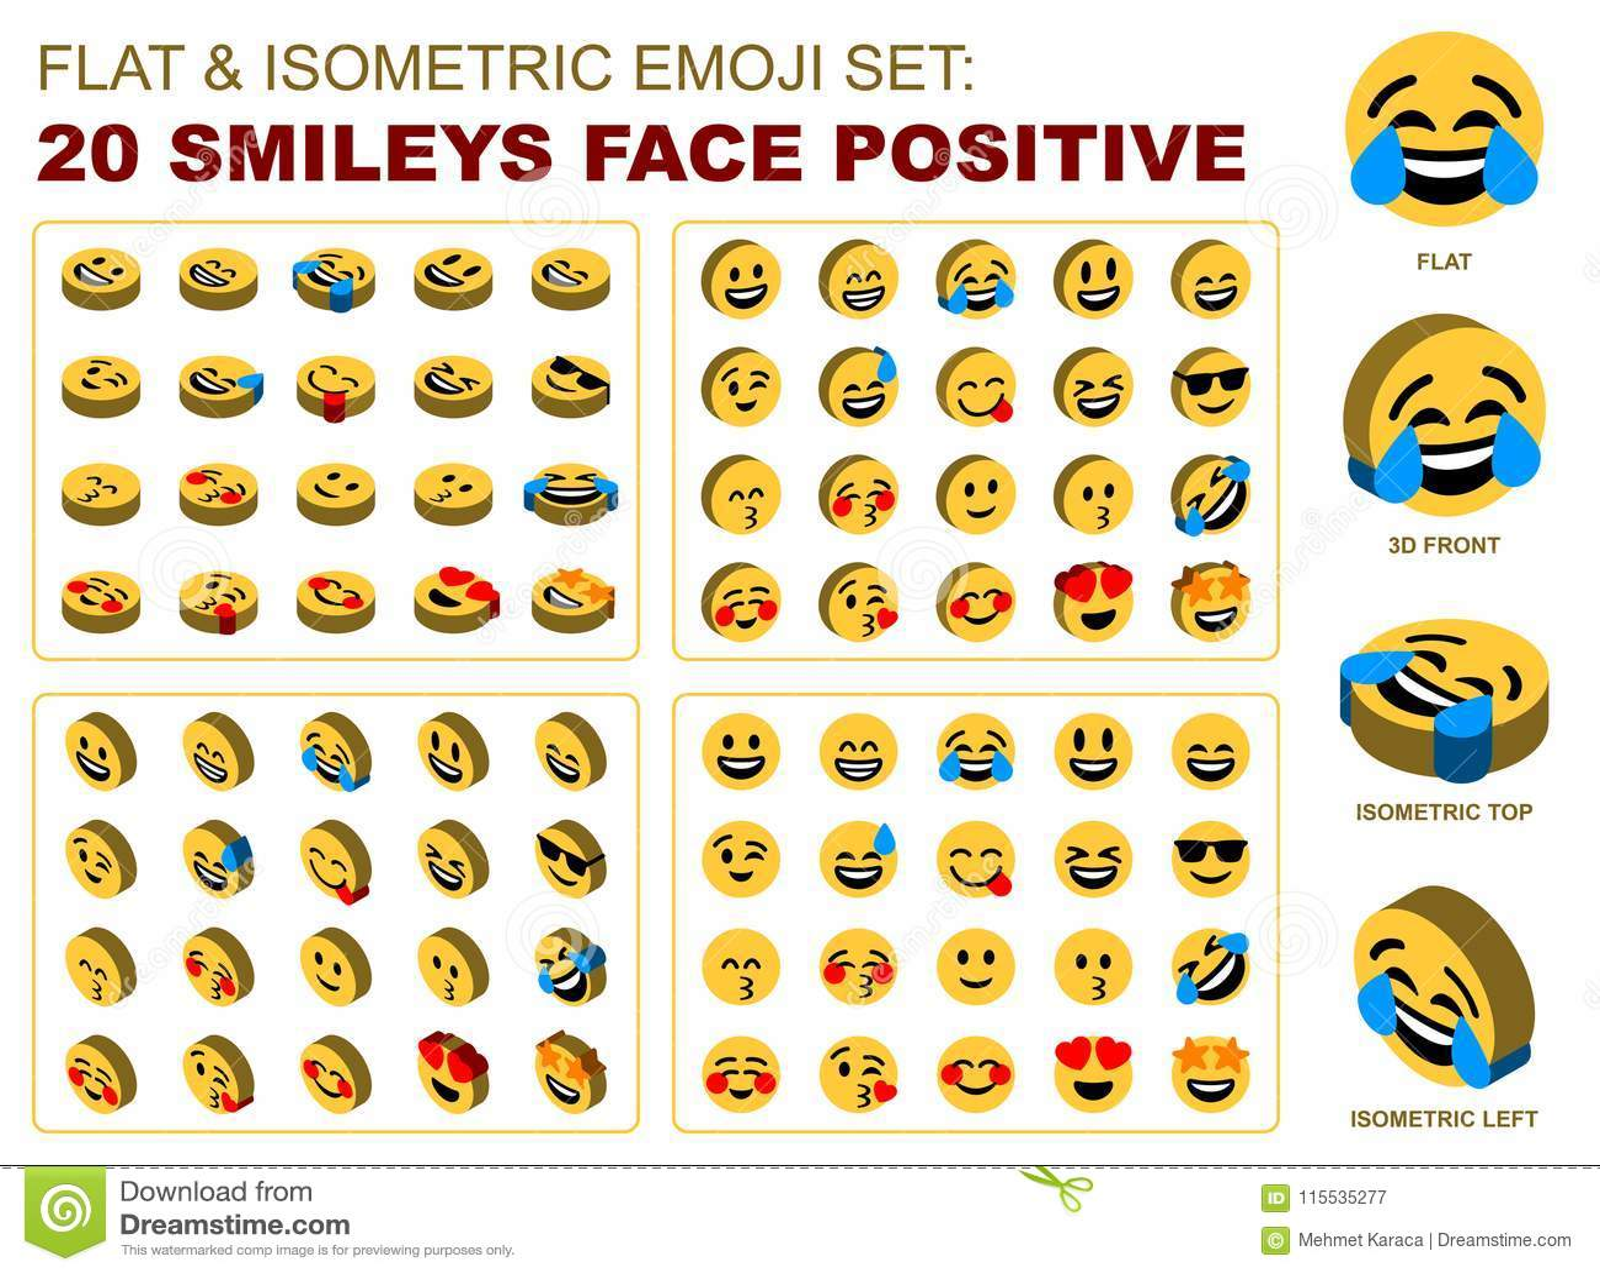 Flat Isometric Emoji Set Smileys Face Positive